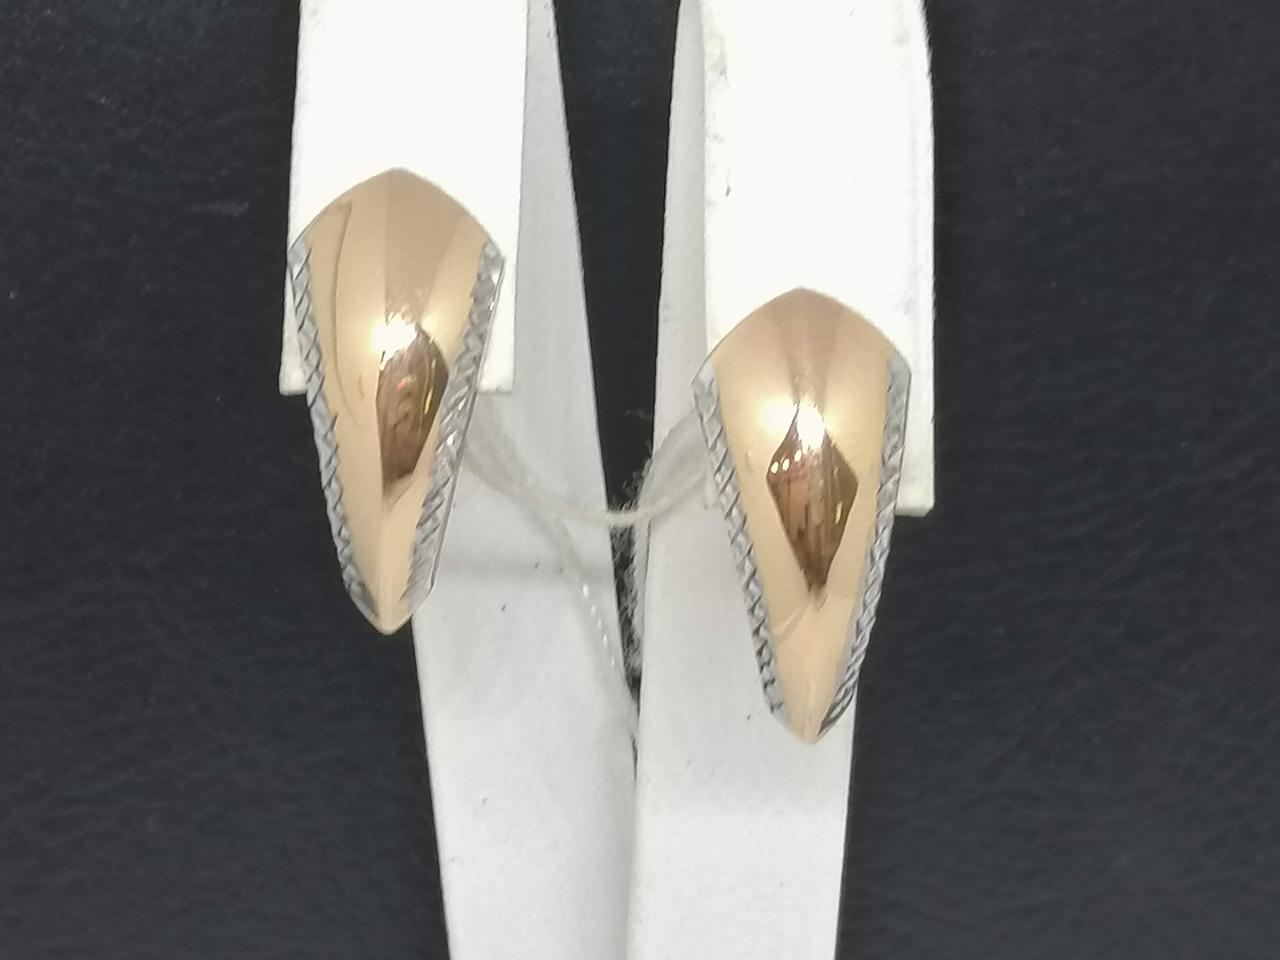 Золотые серьги. Артикул 470375